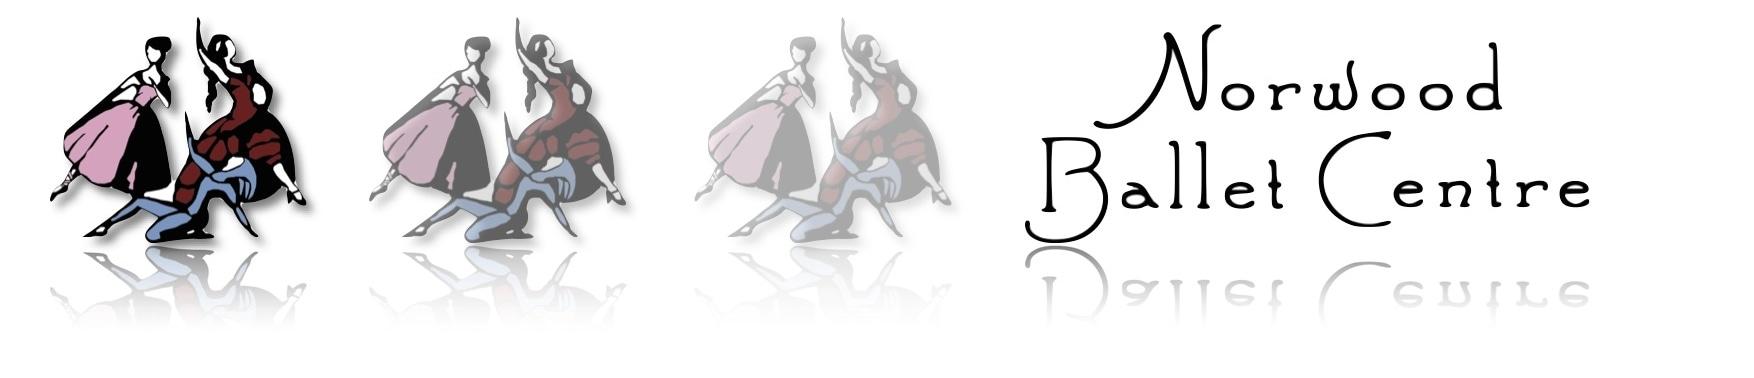 Norwood Ballet